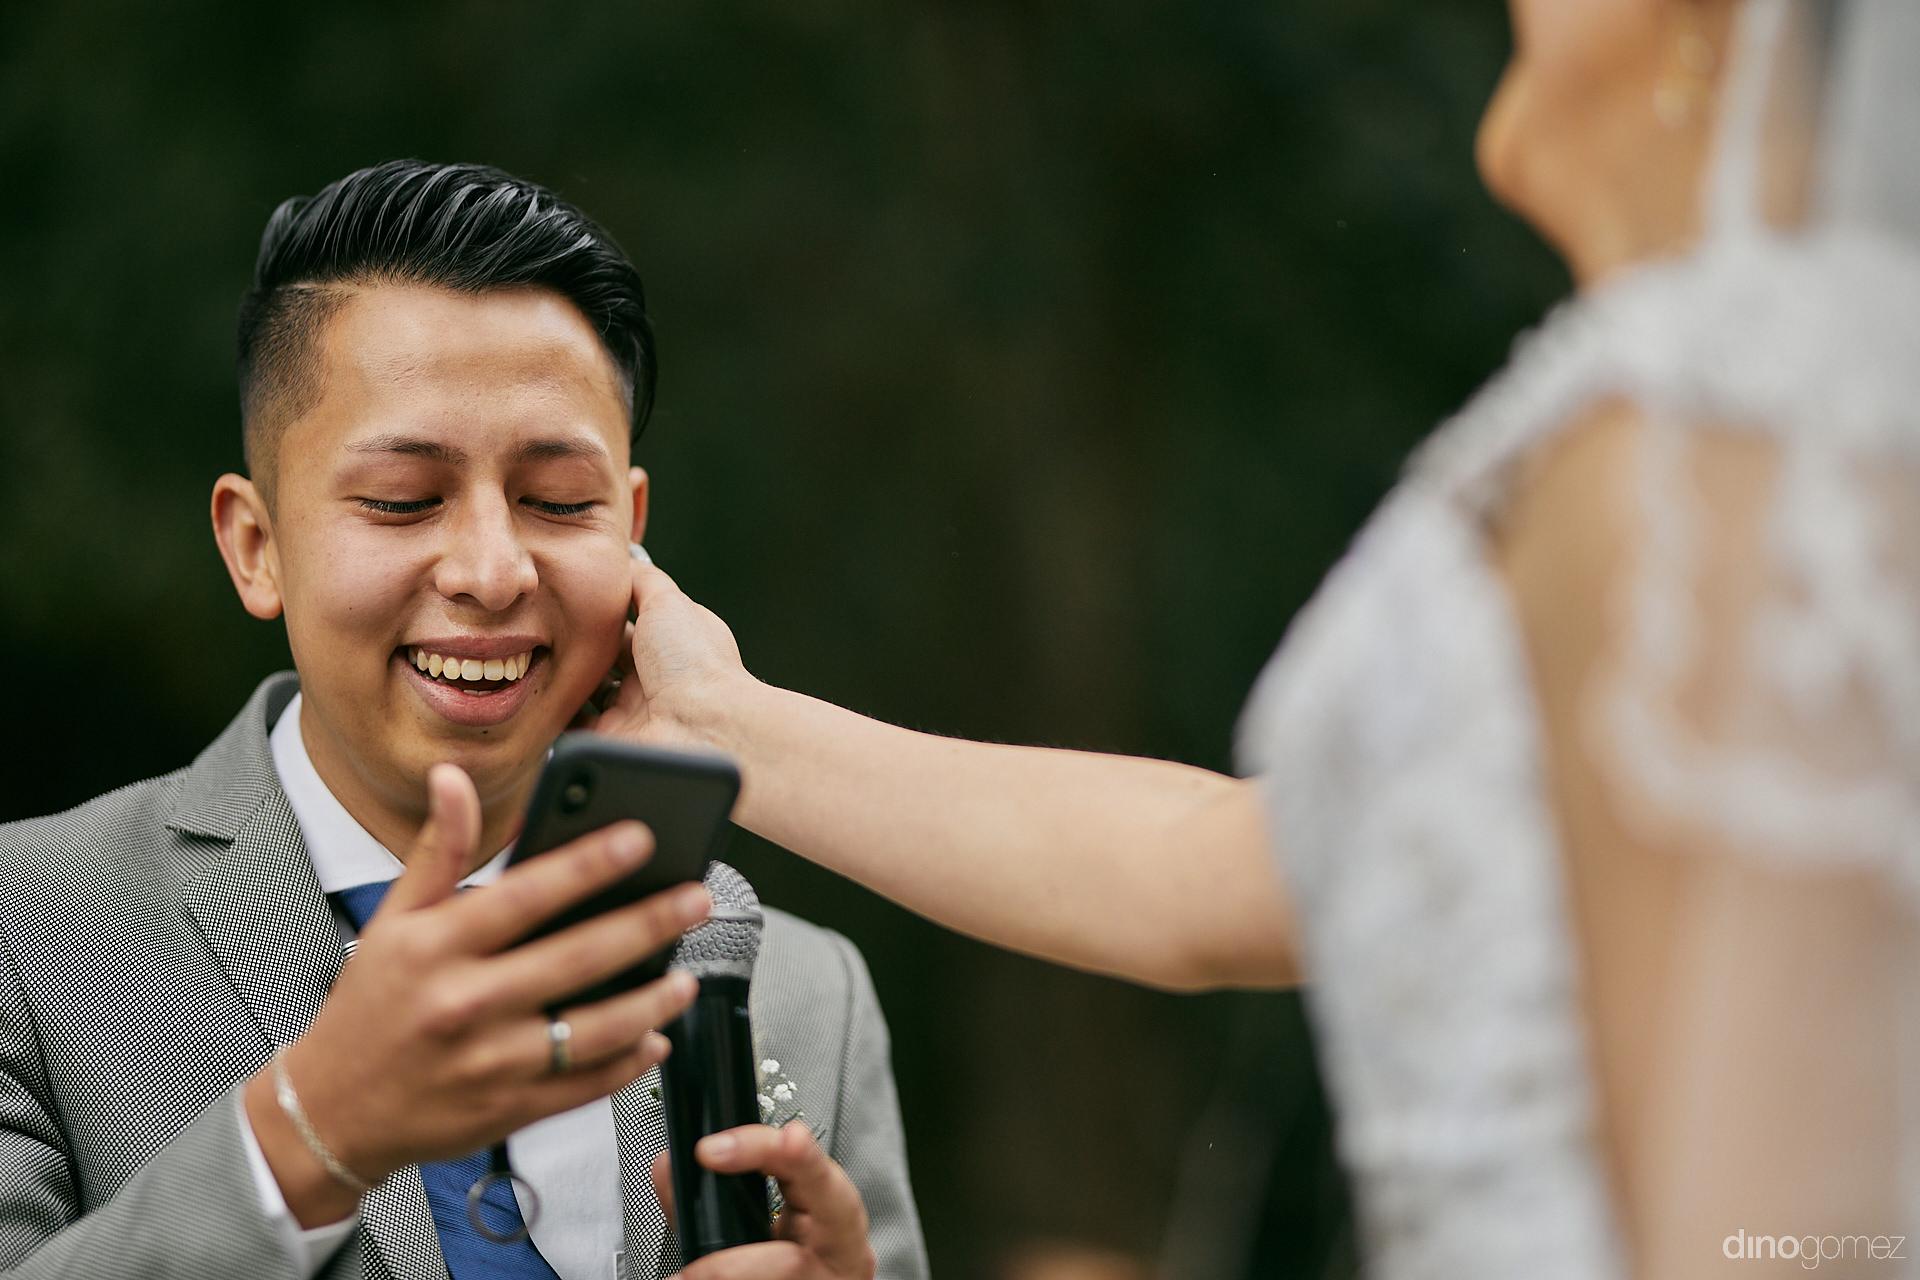 004 - Diy Budget Destination Weddings Can Be Prety Too!